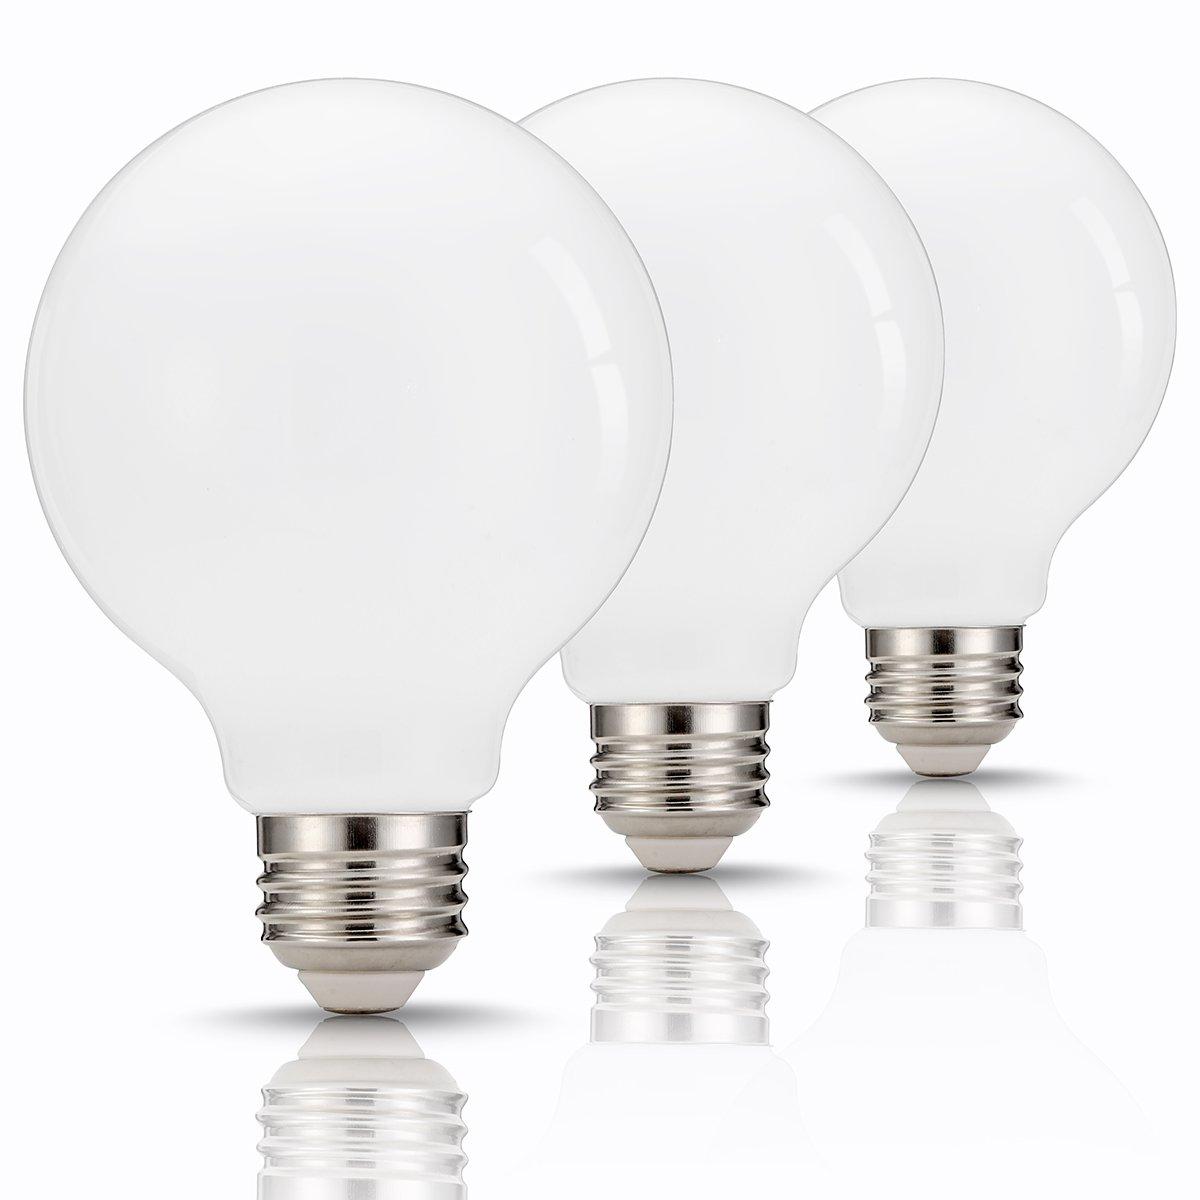 TGMOLD G25 Globe LED Bulb 60W Equivalent, 9W, Base E26/E27, Daylight 4000K Vanity Light Bulb for Makeup, Living Room, (800LM) Non Dimmable Decorative Light, Pack of 3